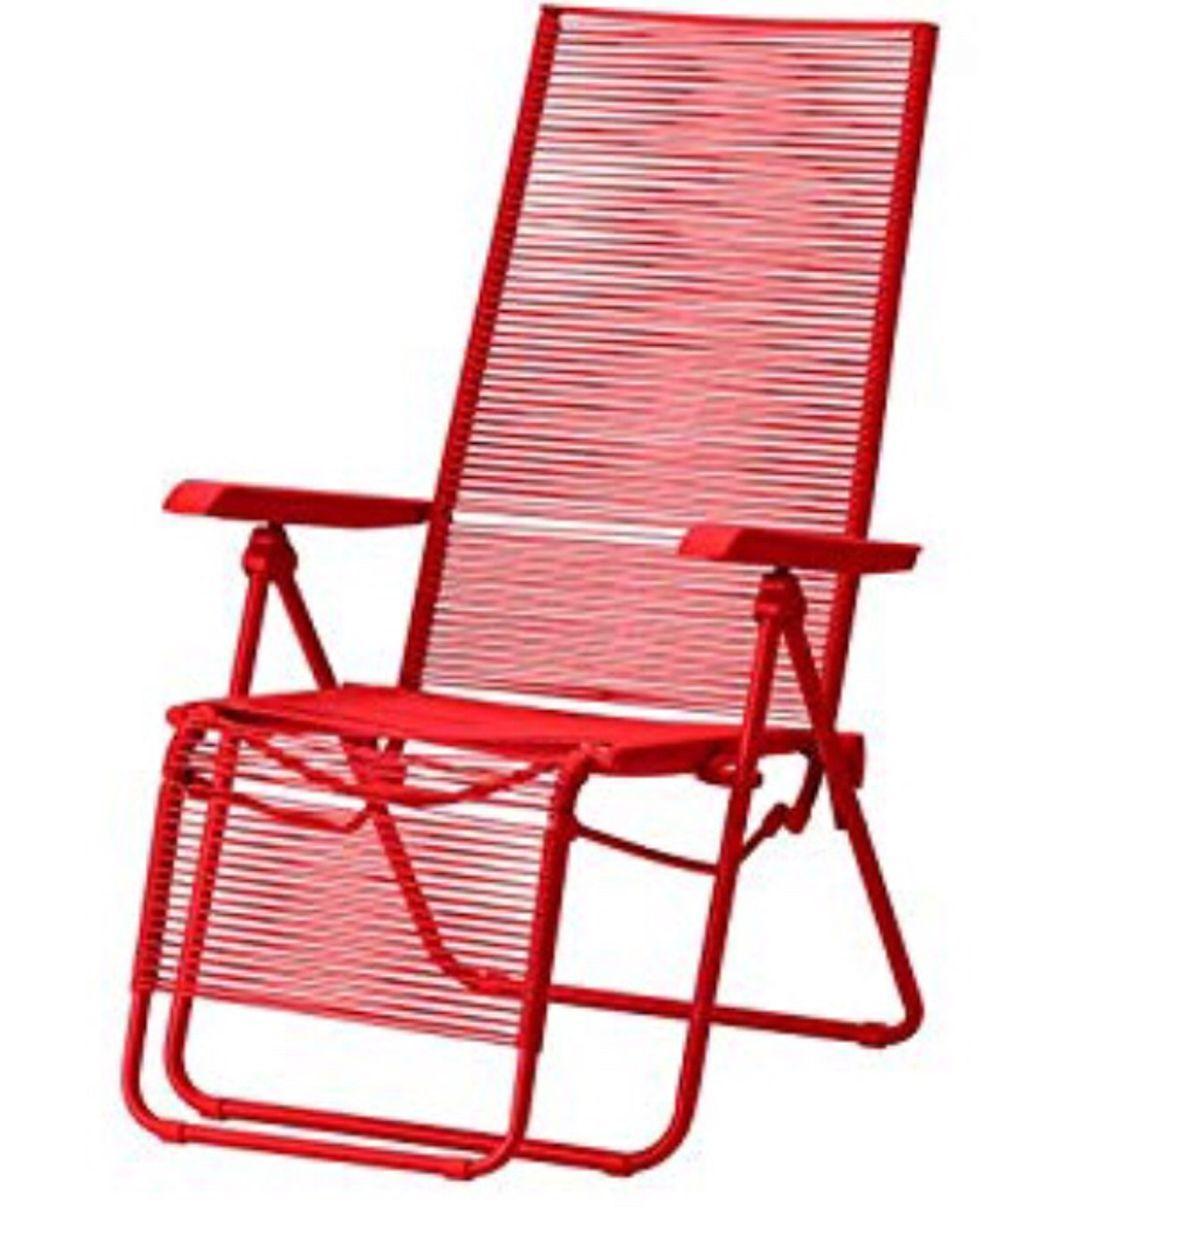 Holz Liegestuhl Ikea